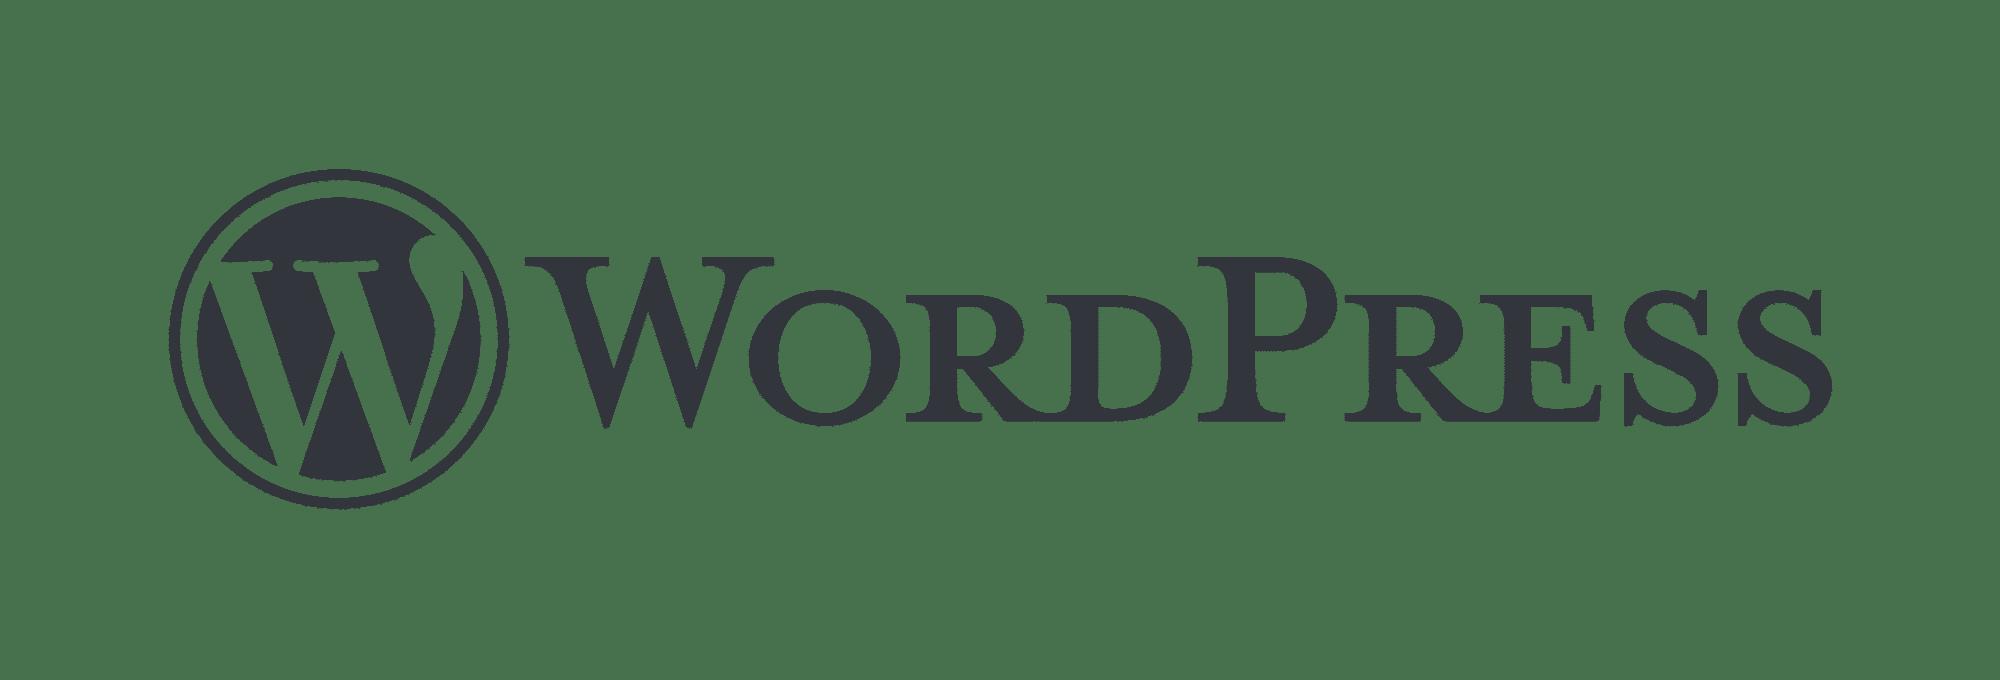 Wordpress - CPH digital